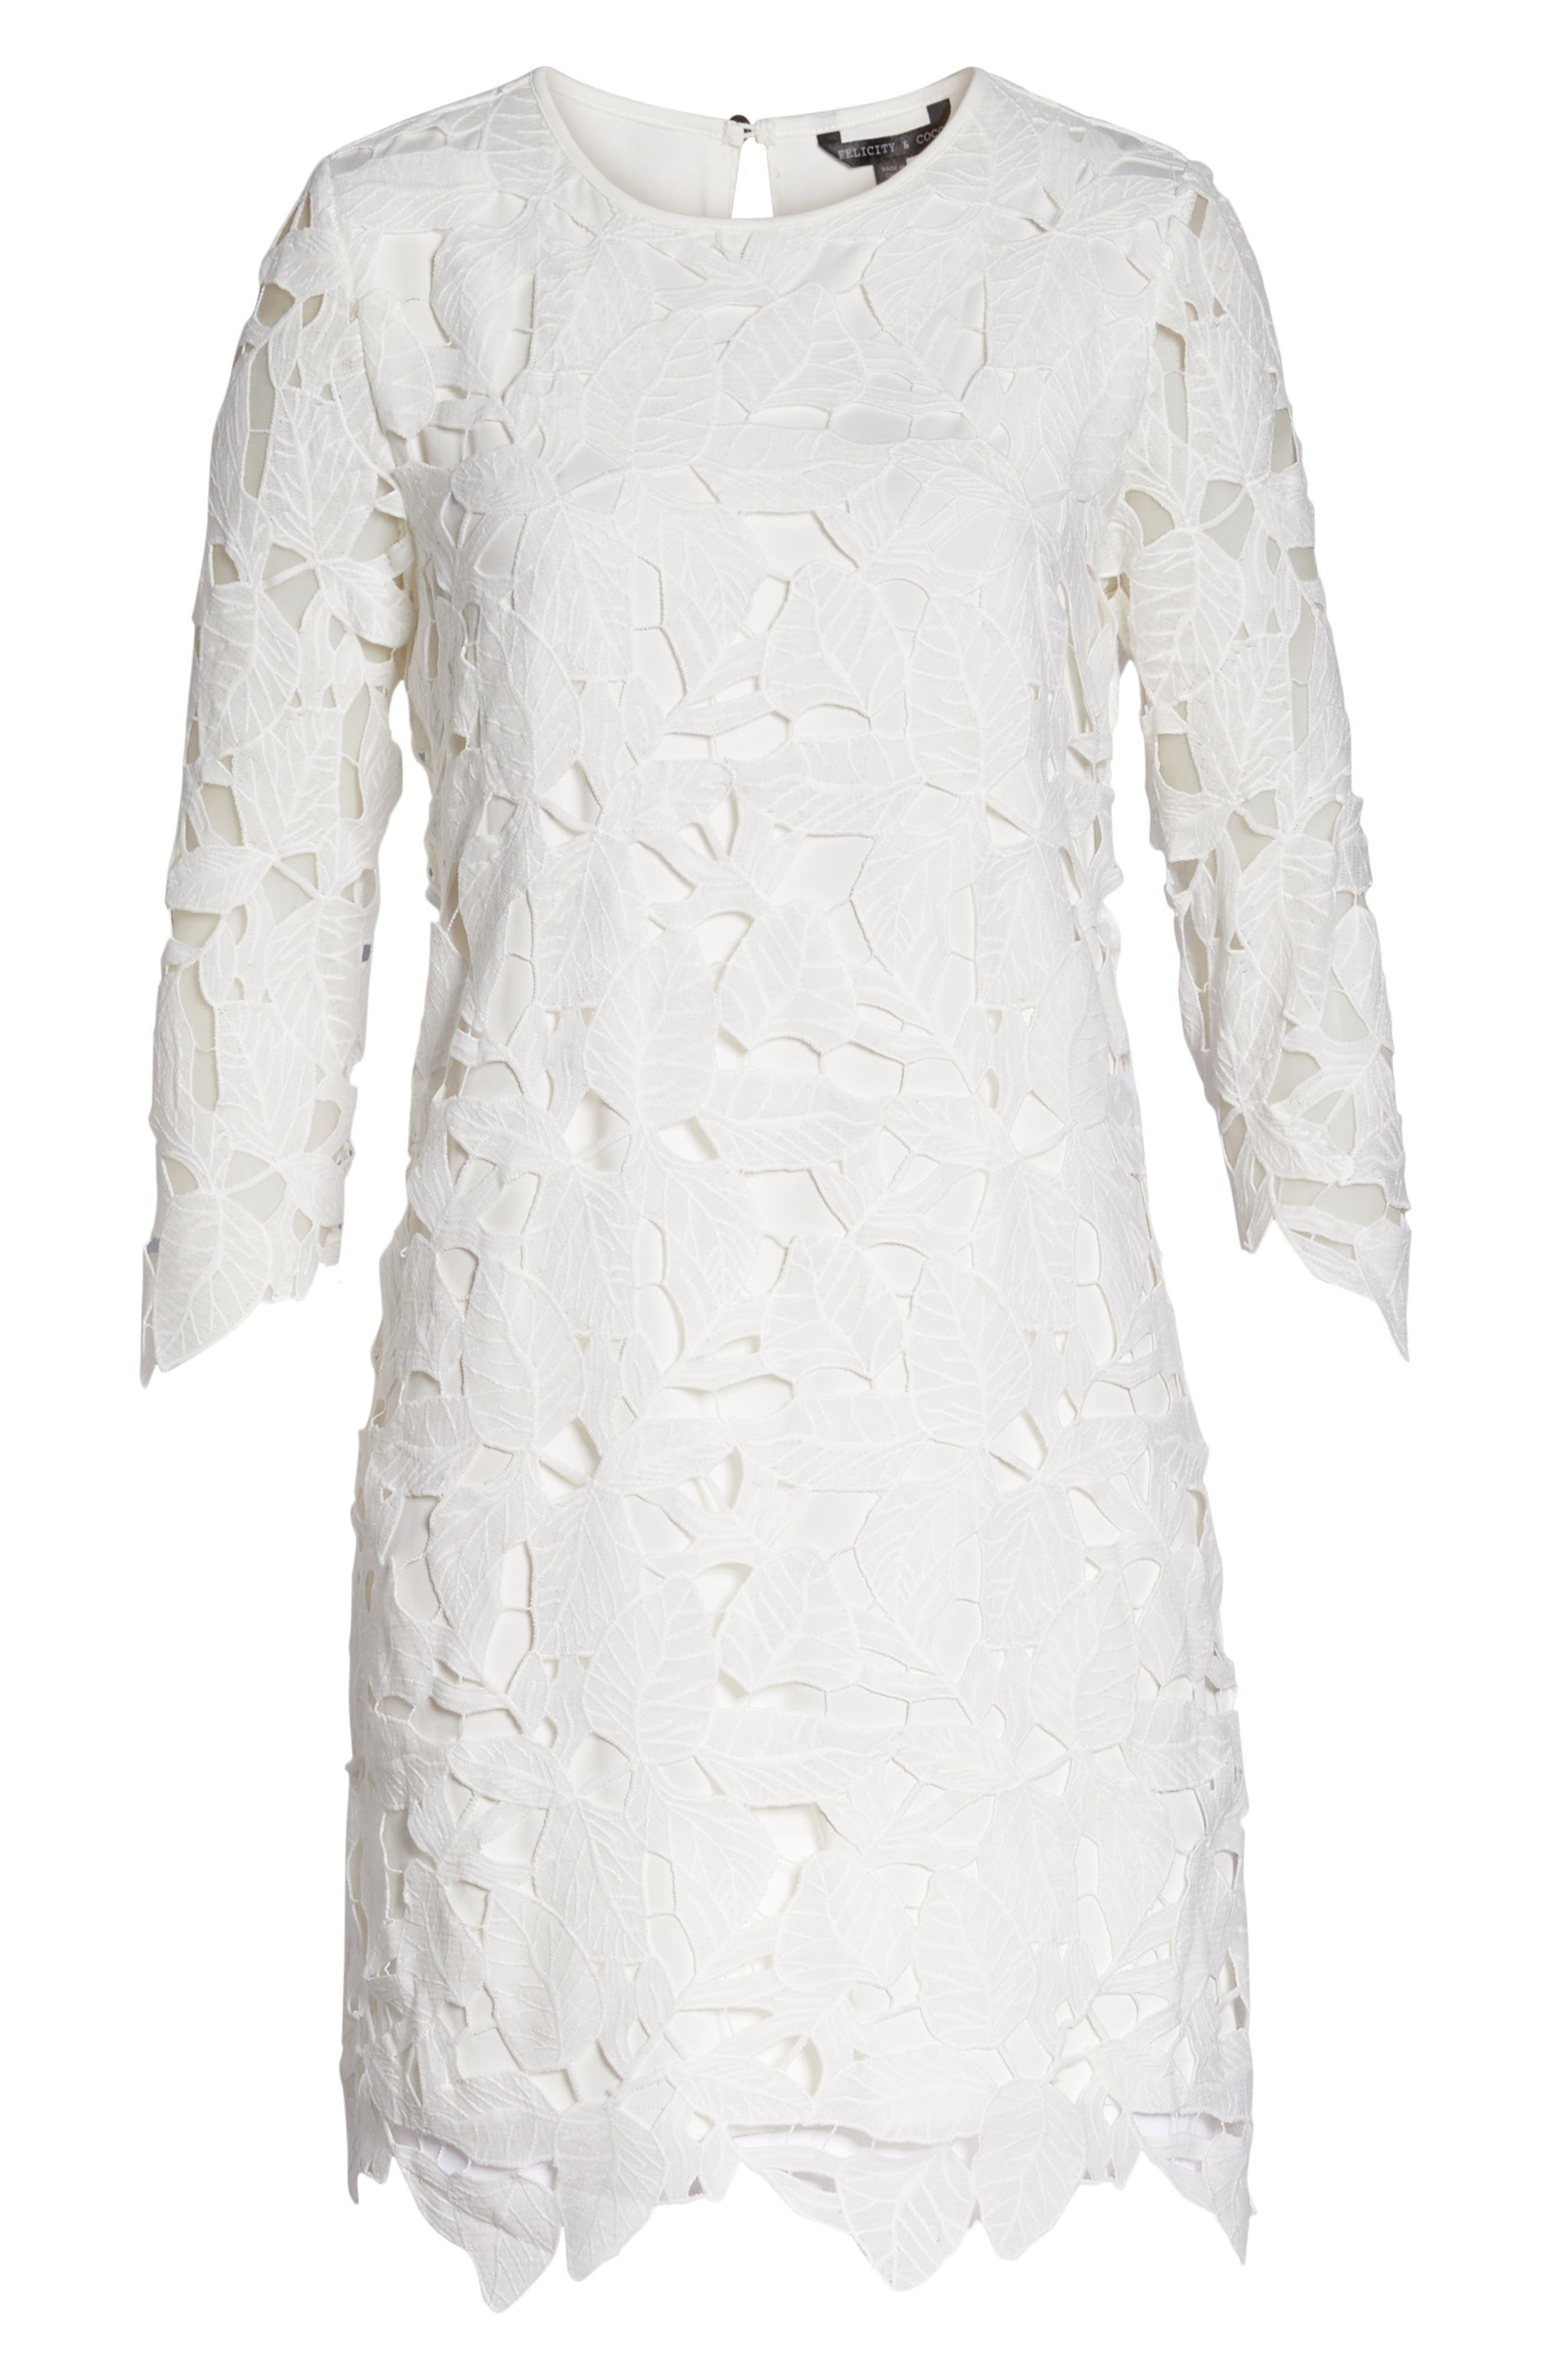 Skye Lace Shift Dress,                             Alternate thumbnail 7, color,                             100